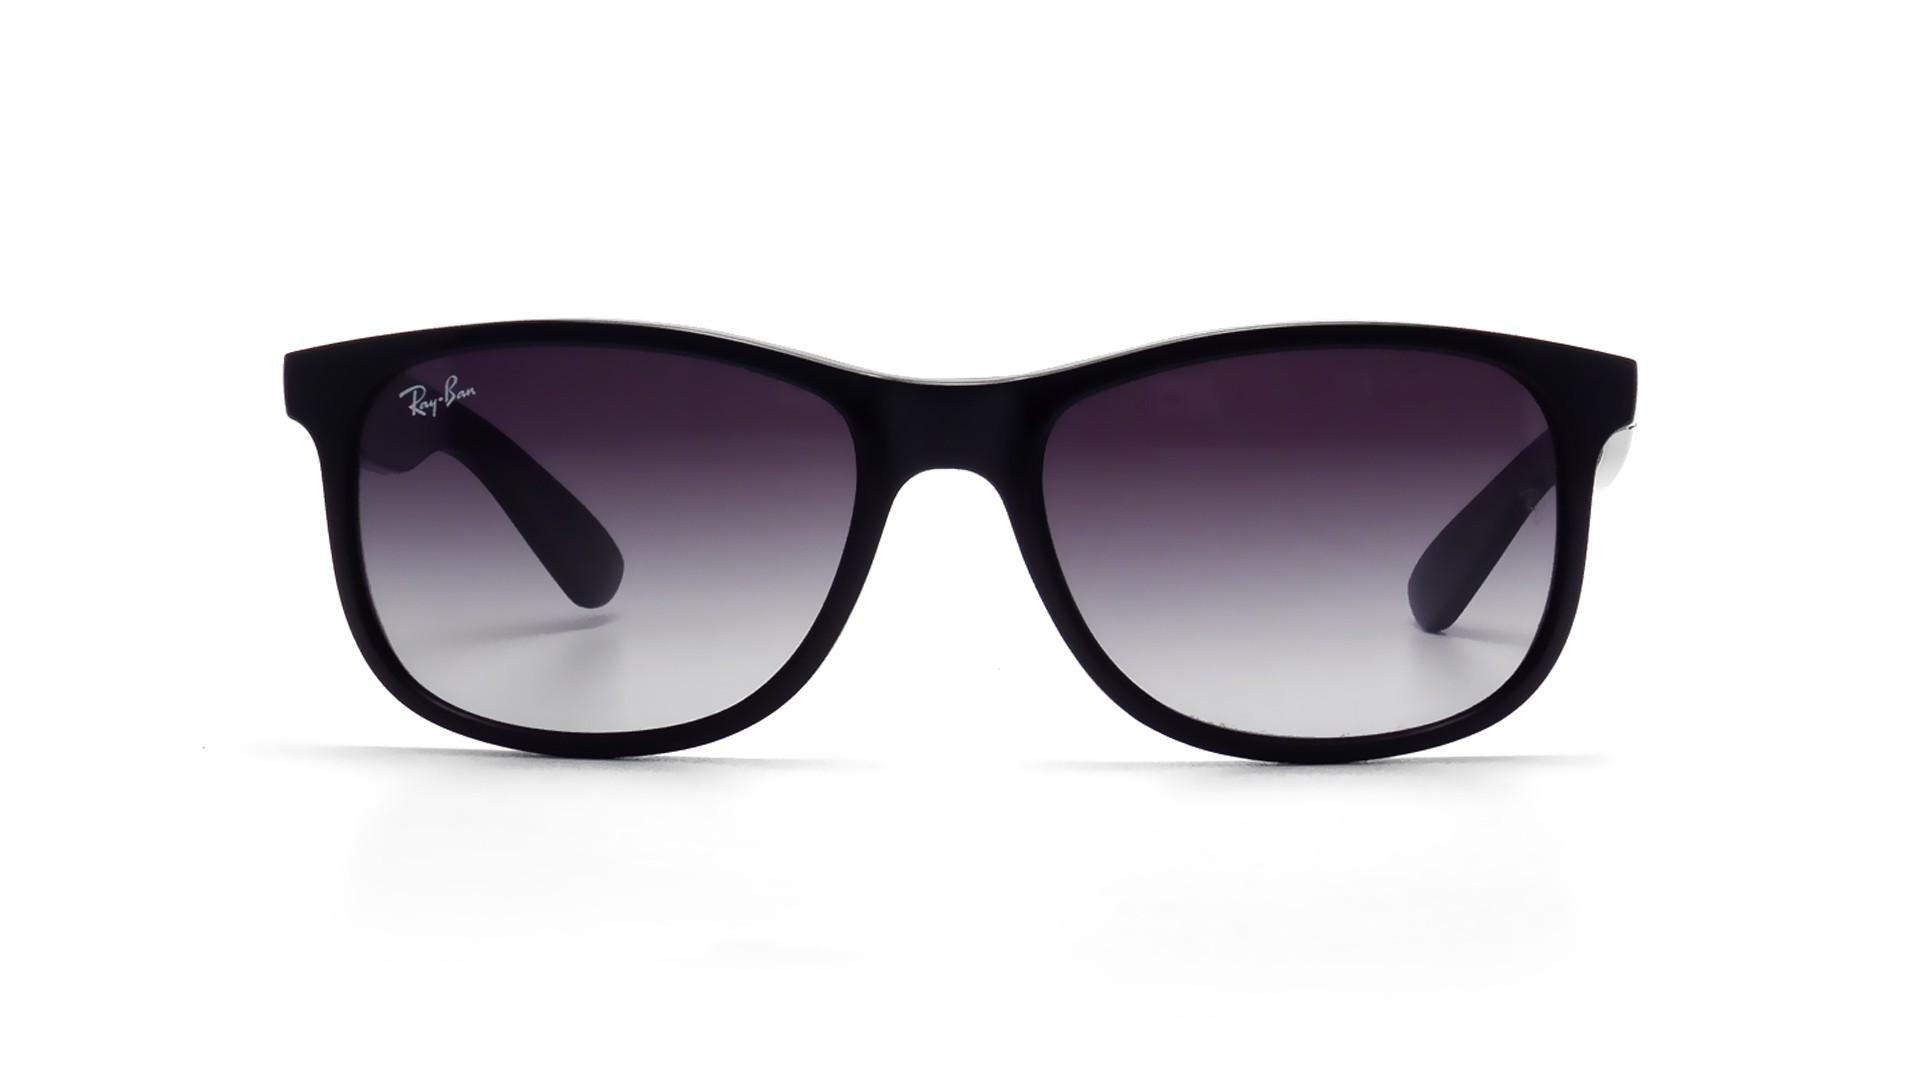 90b7ddc6d2c Ray Ban Andy Rb4202 Wayfarer Sunglasses « Heritage Malta